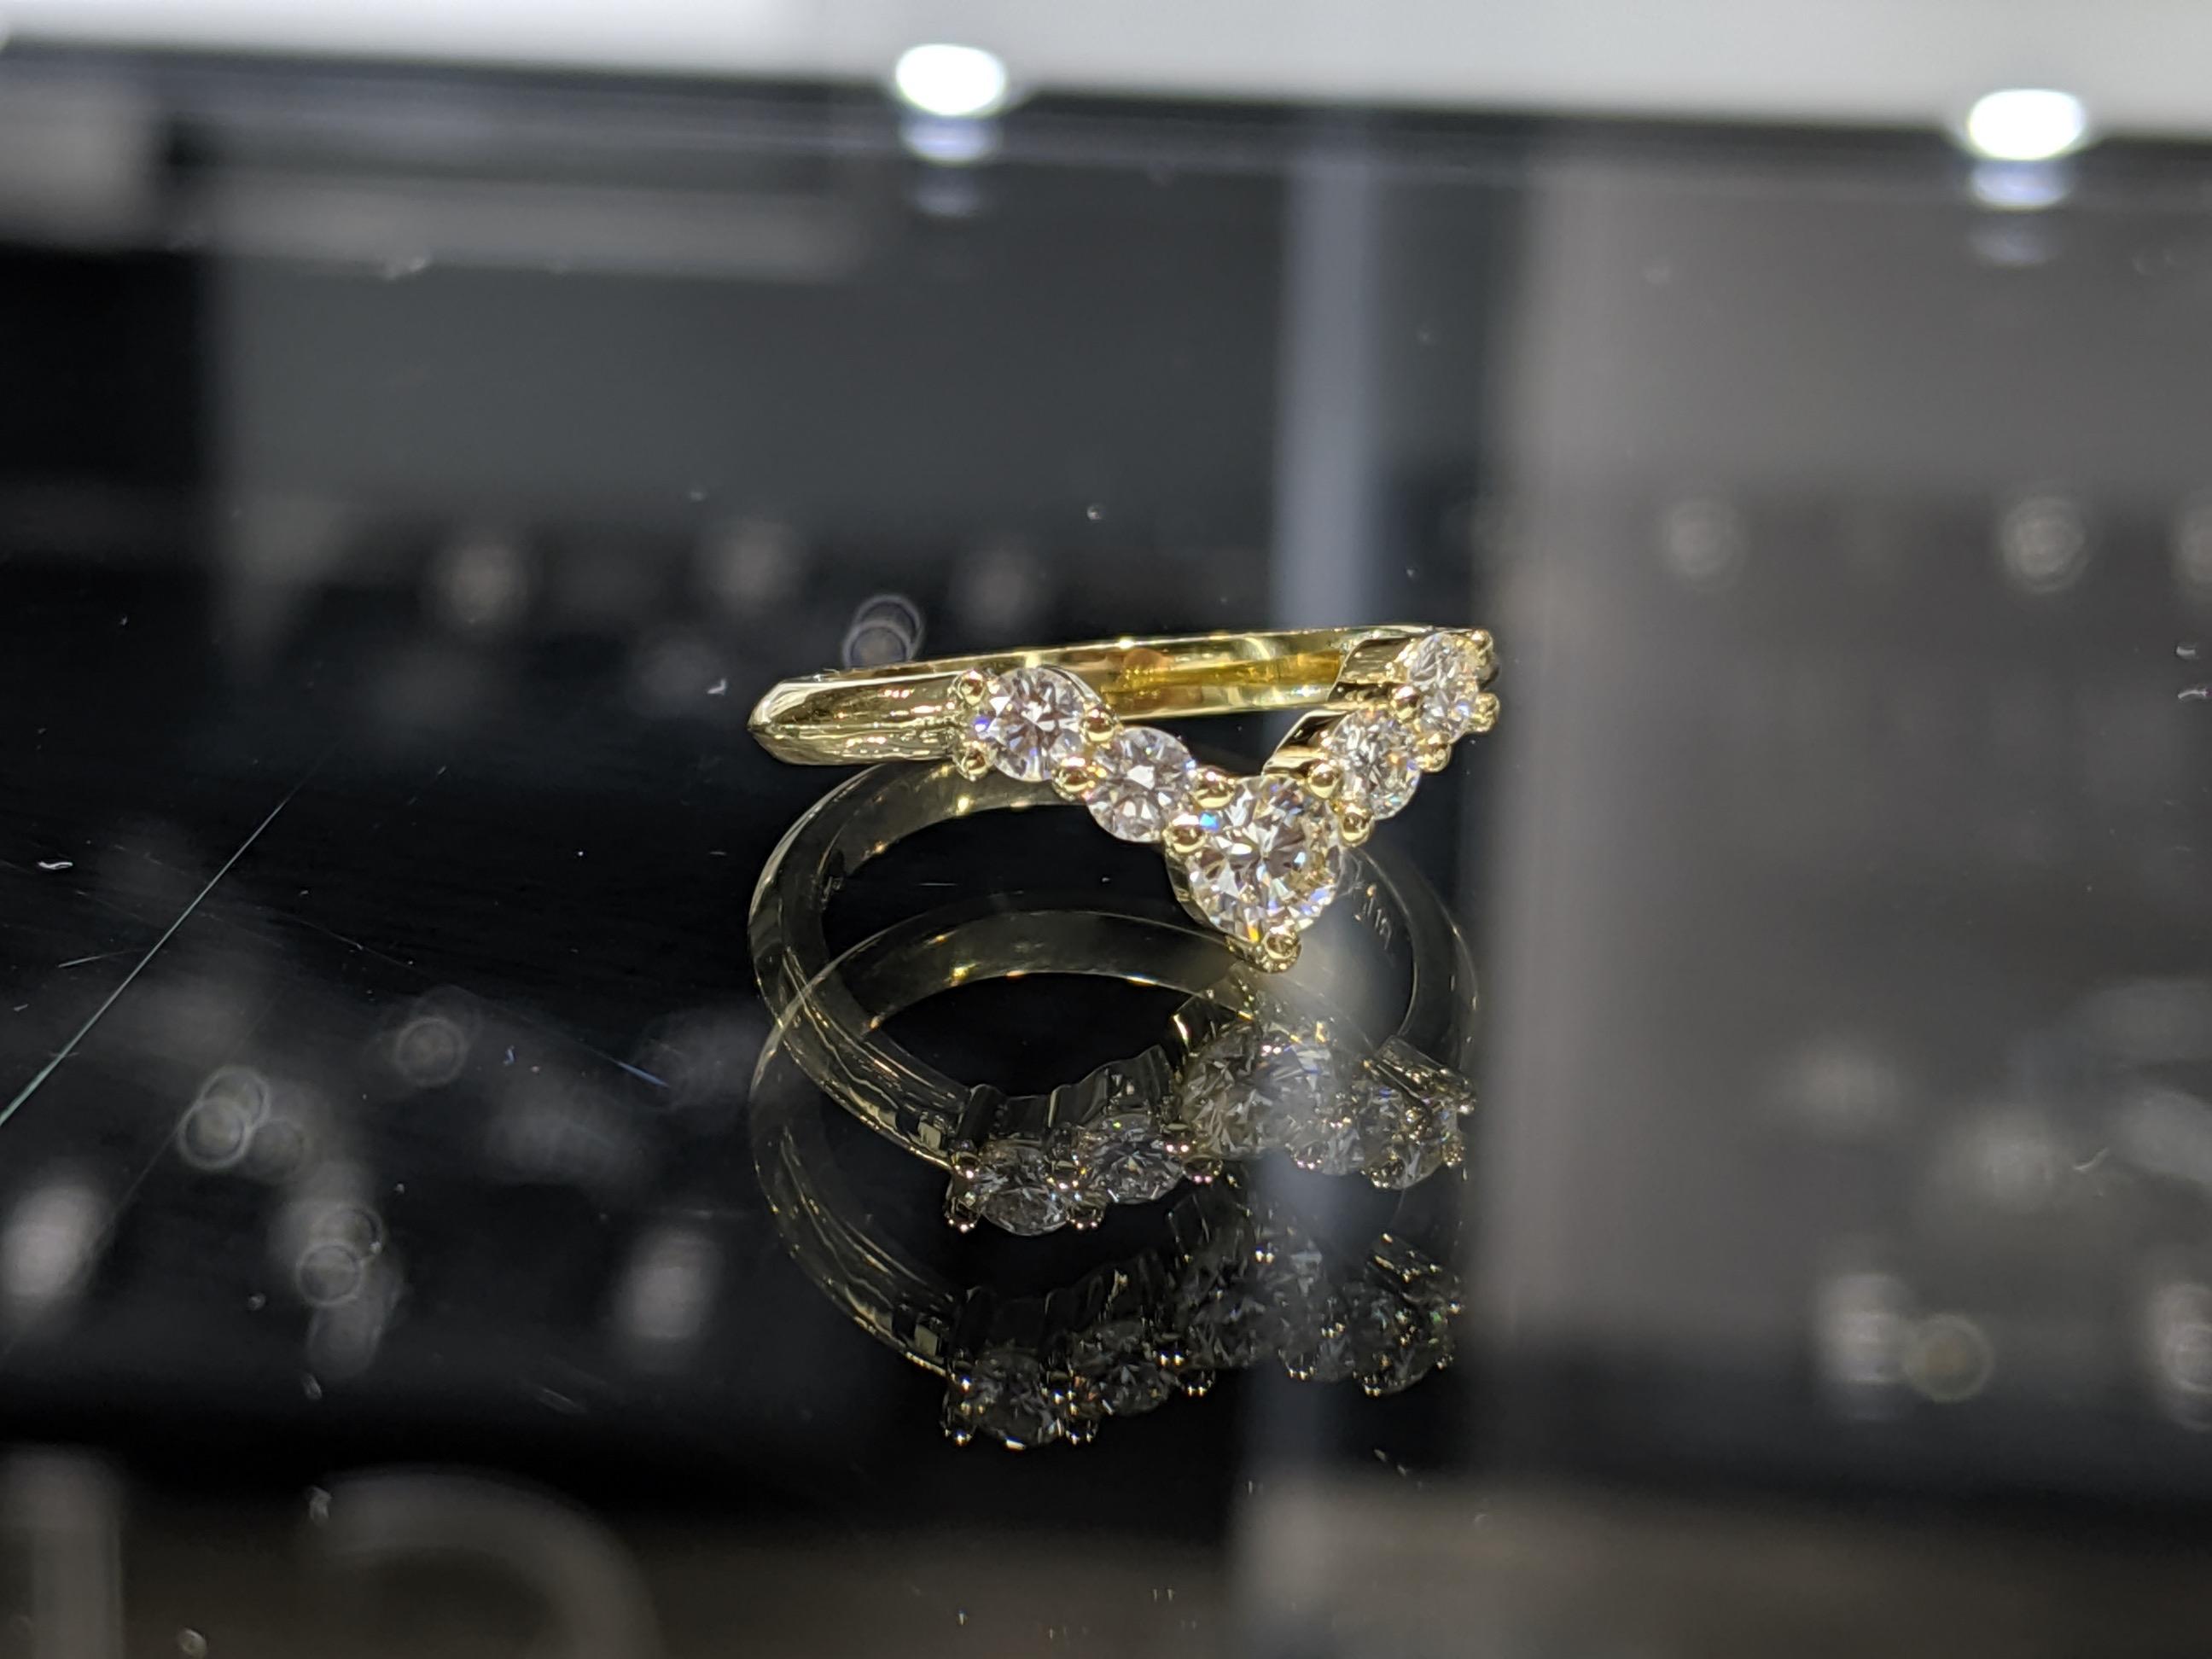 Bucci's Jewelry & Design